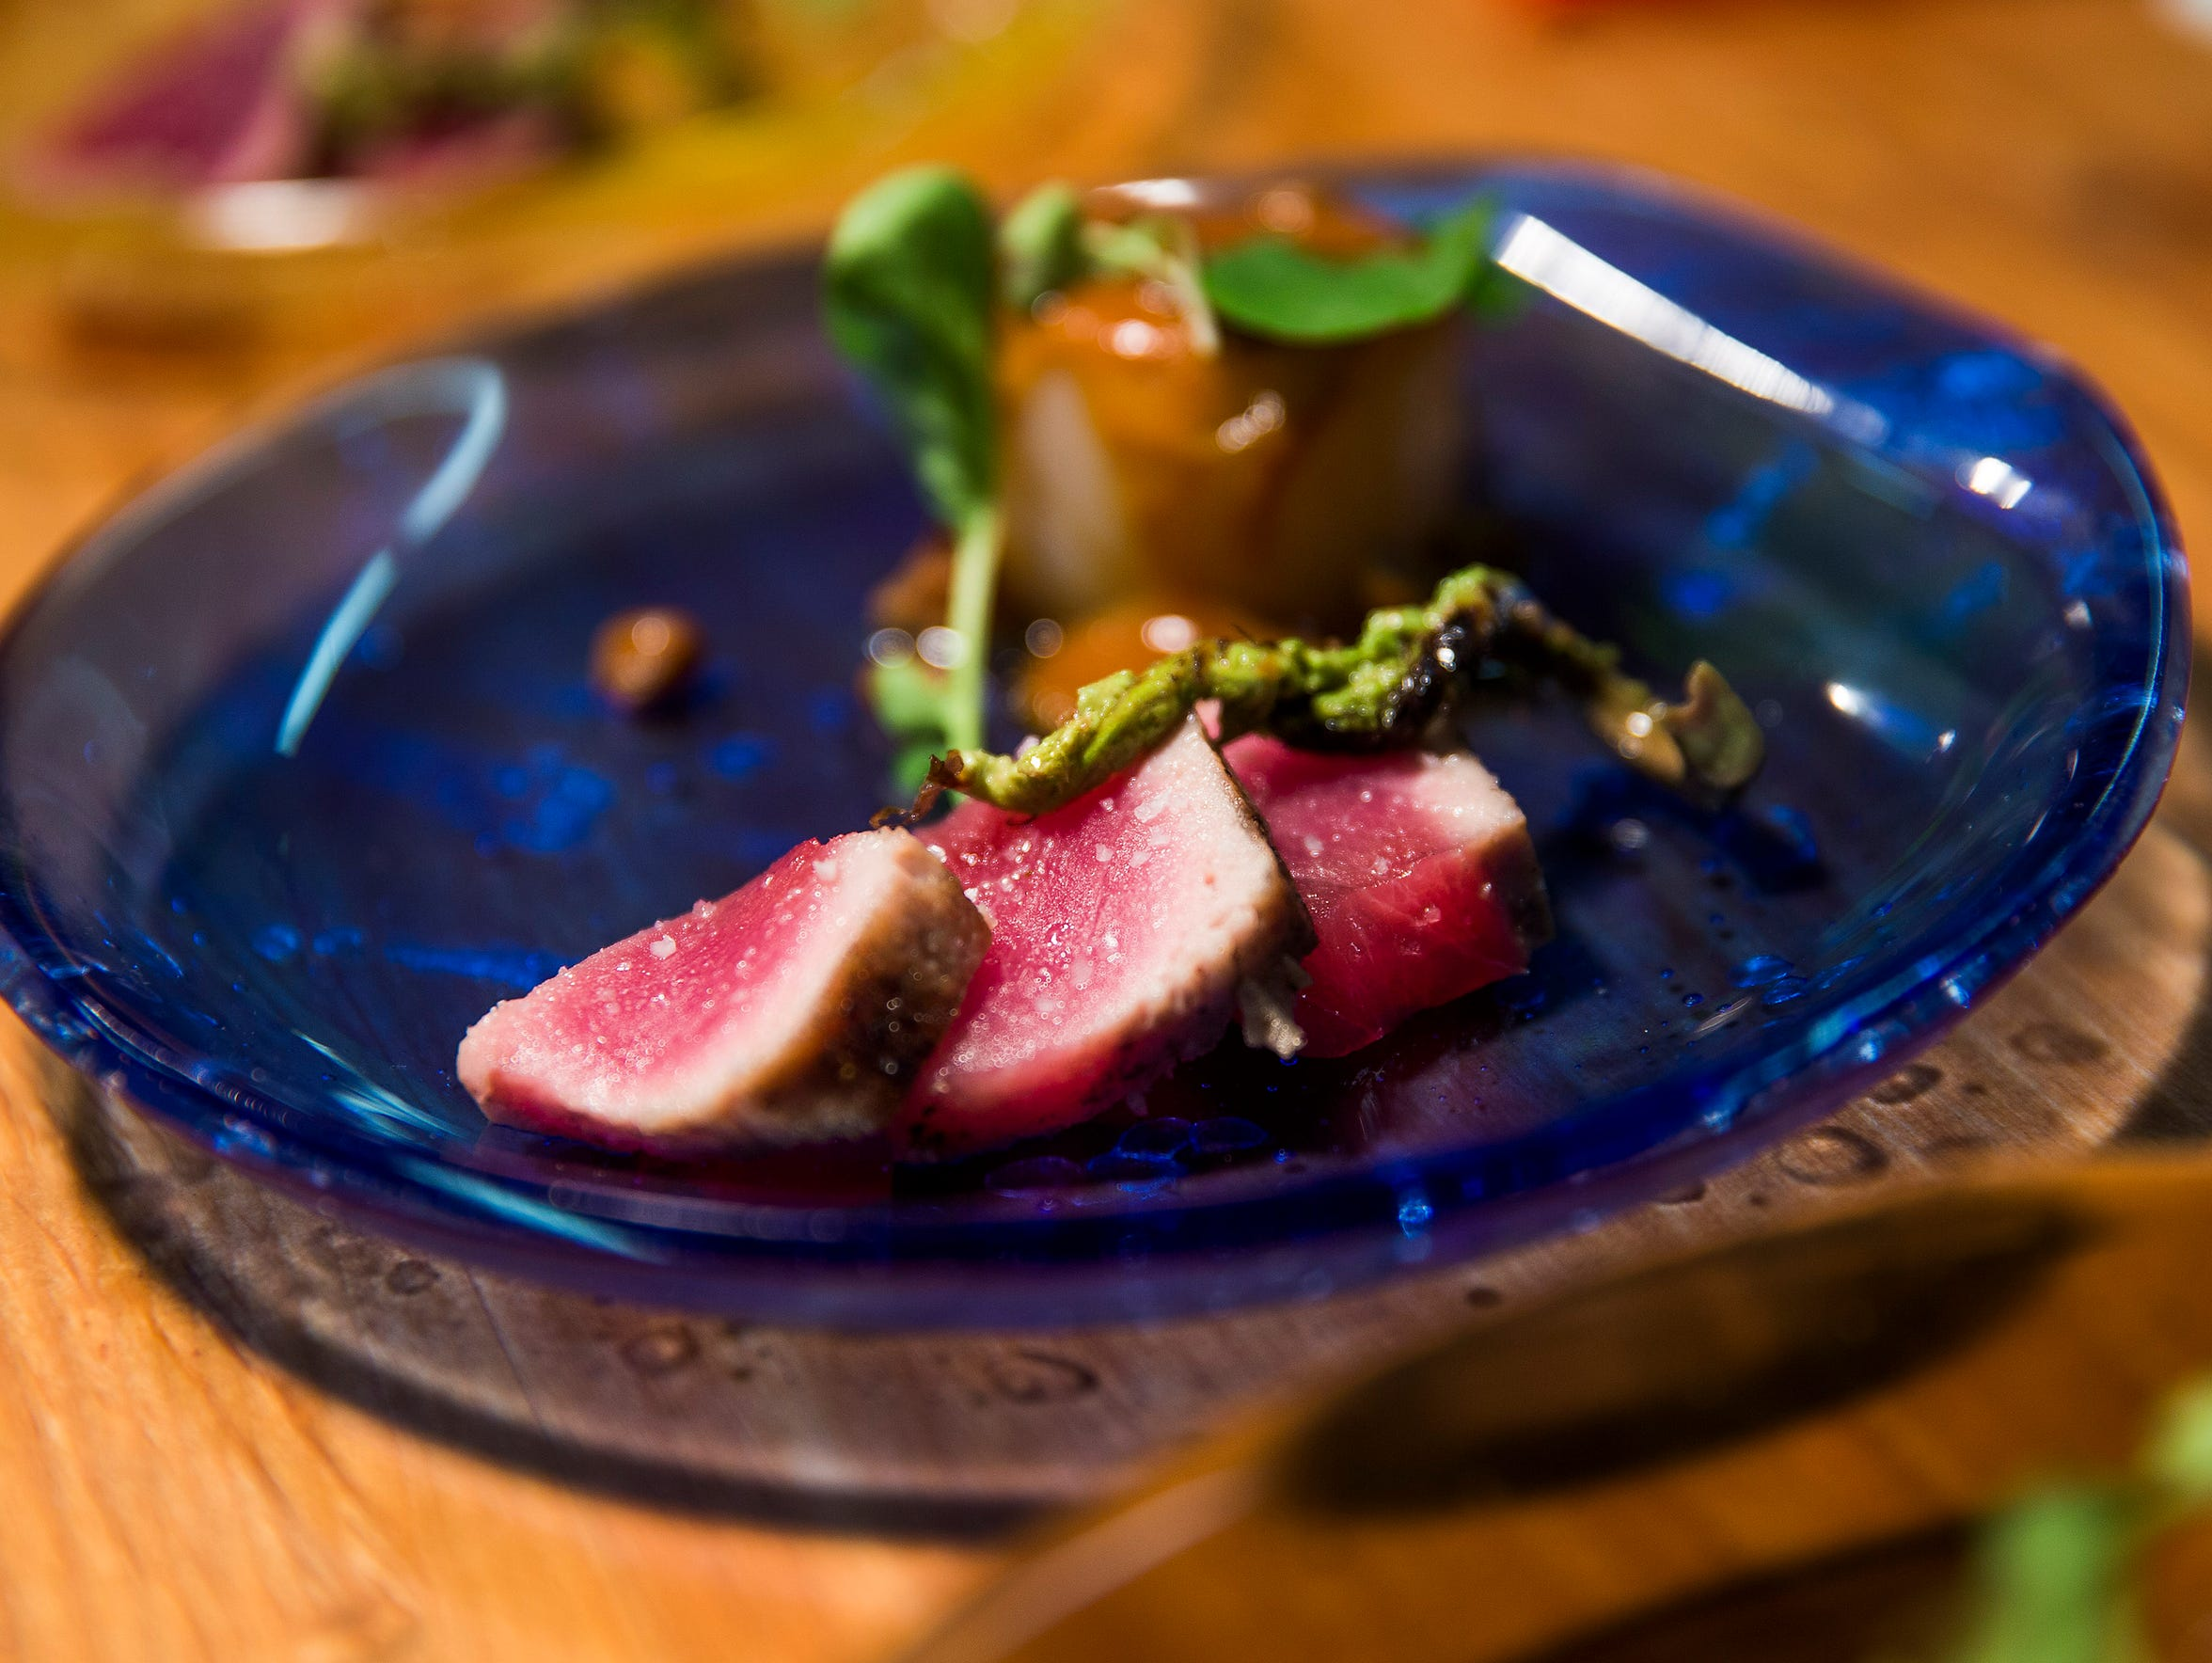 Charcoal seared Bluefin tuna at Binkley's Restaurant.